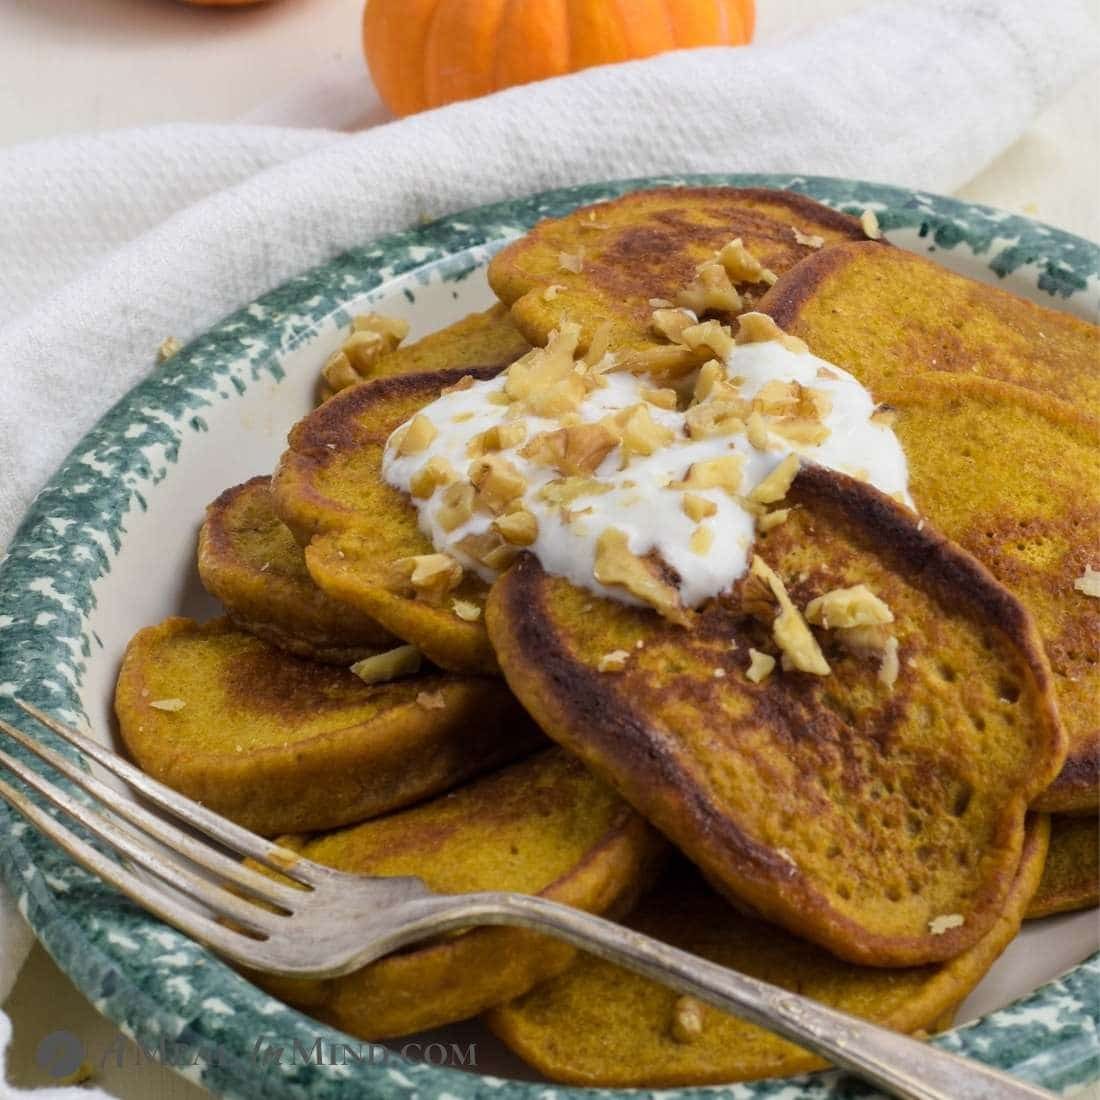 Pumpkin Protein Pancakes on ceramic platter with yogurt and walnuts